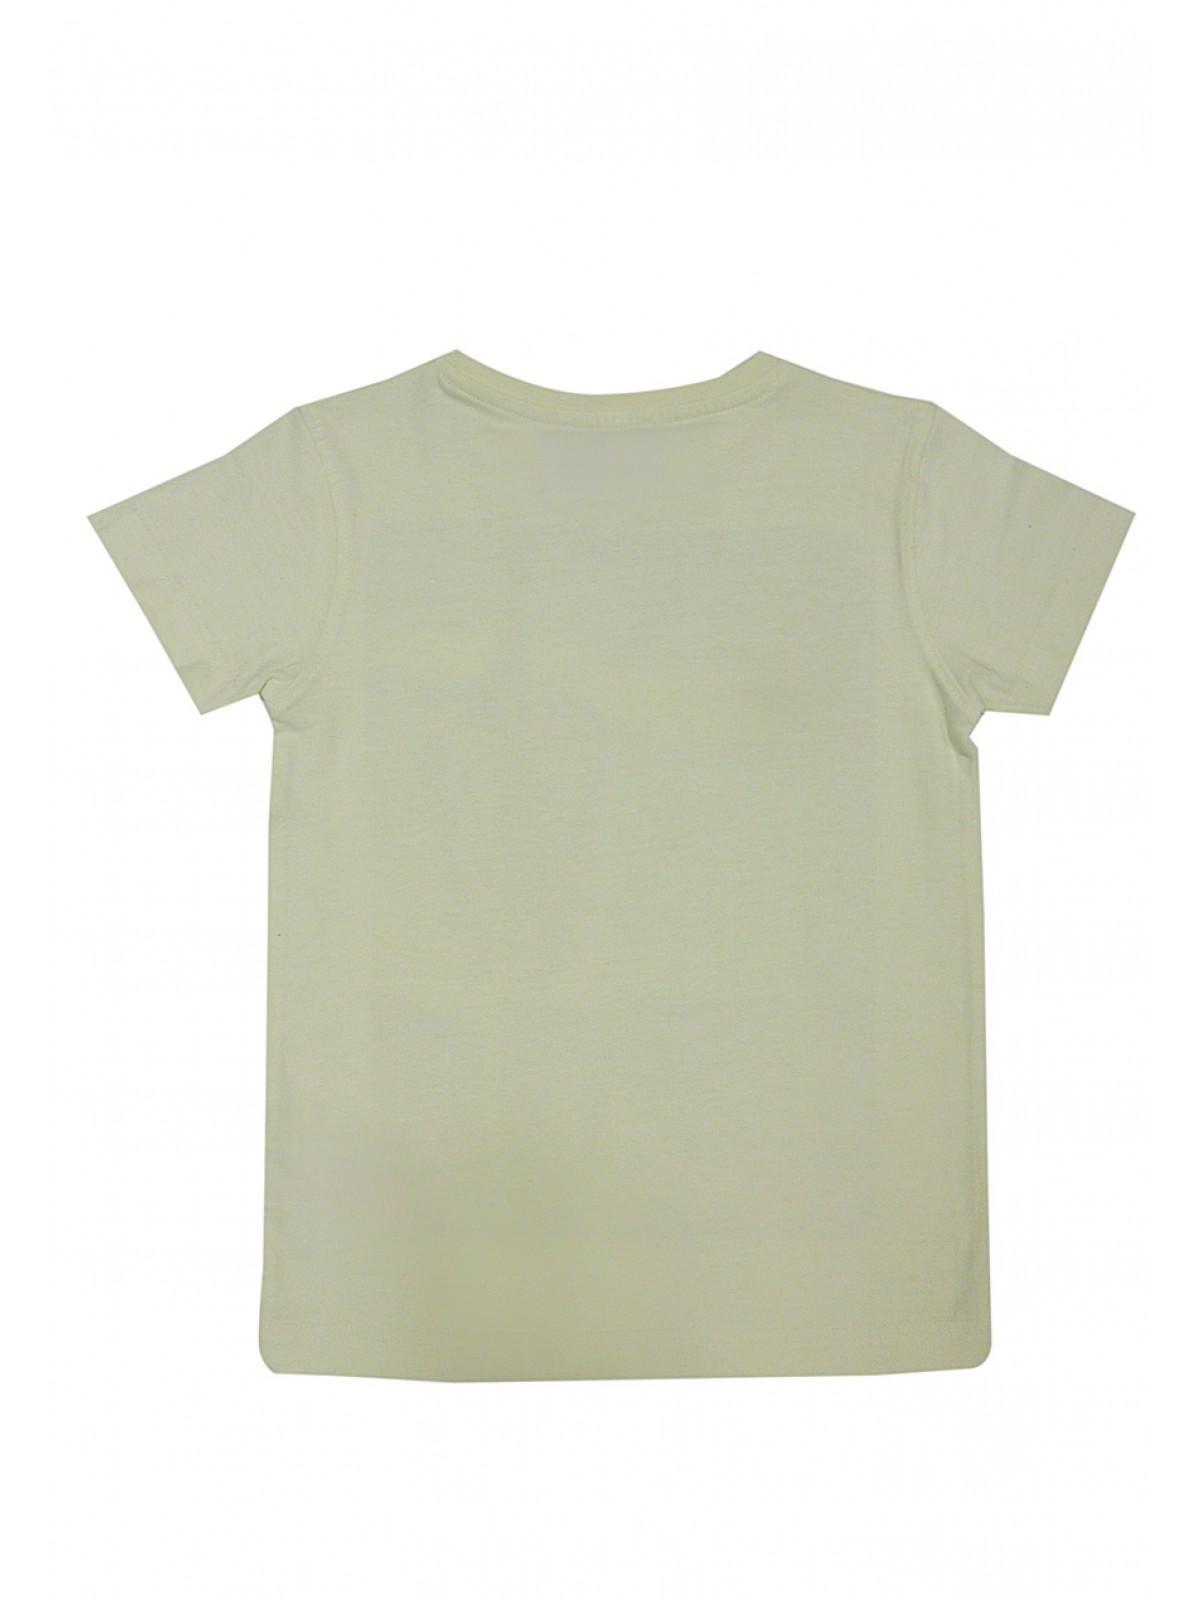 0114d83dc Home; Older Boys Cactus T-shirt. Back. PreviousNext